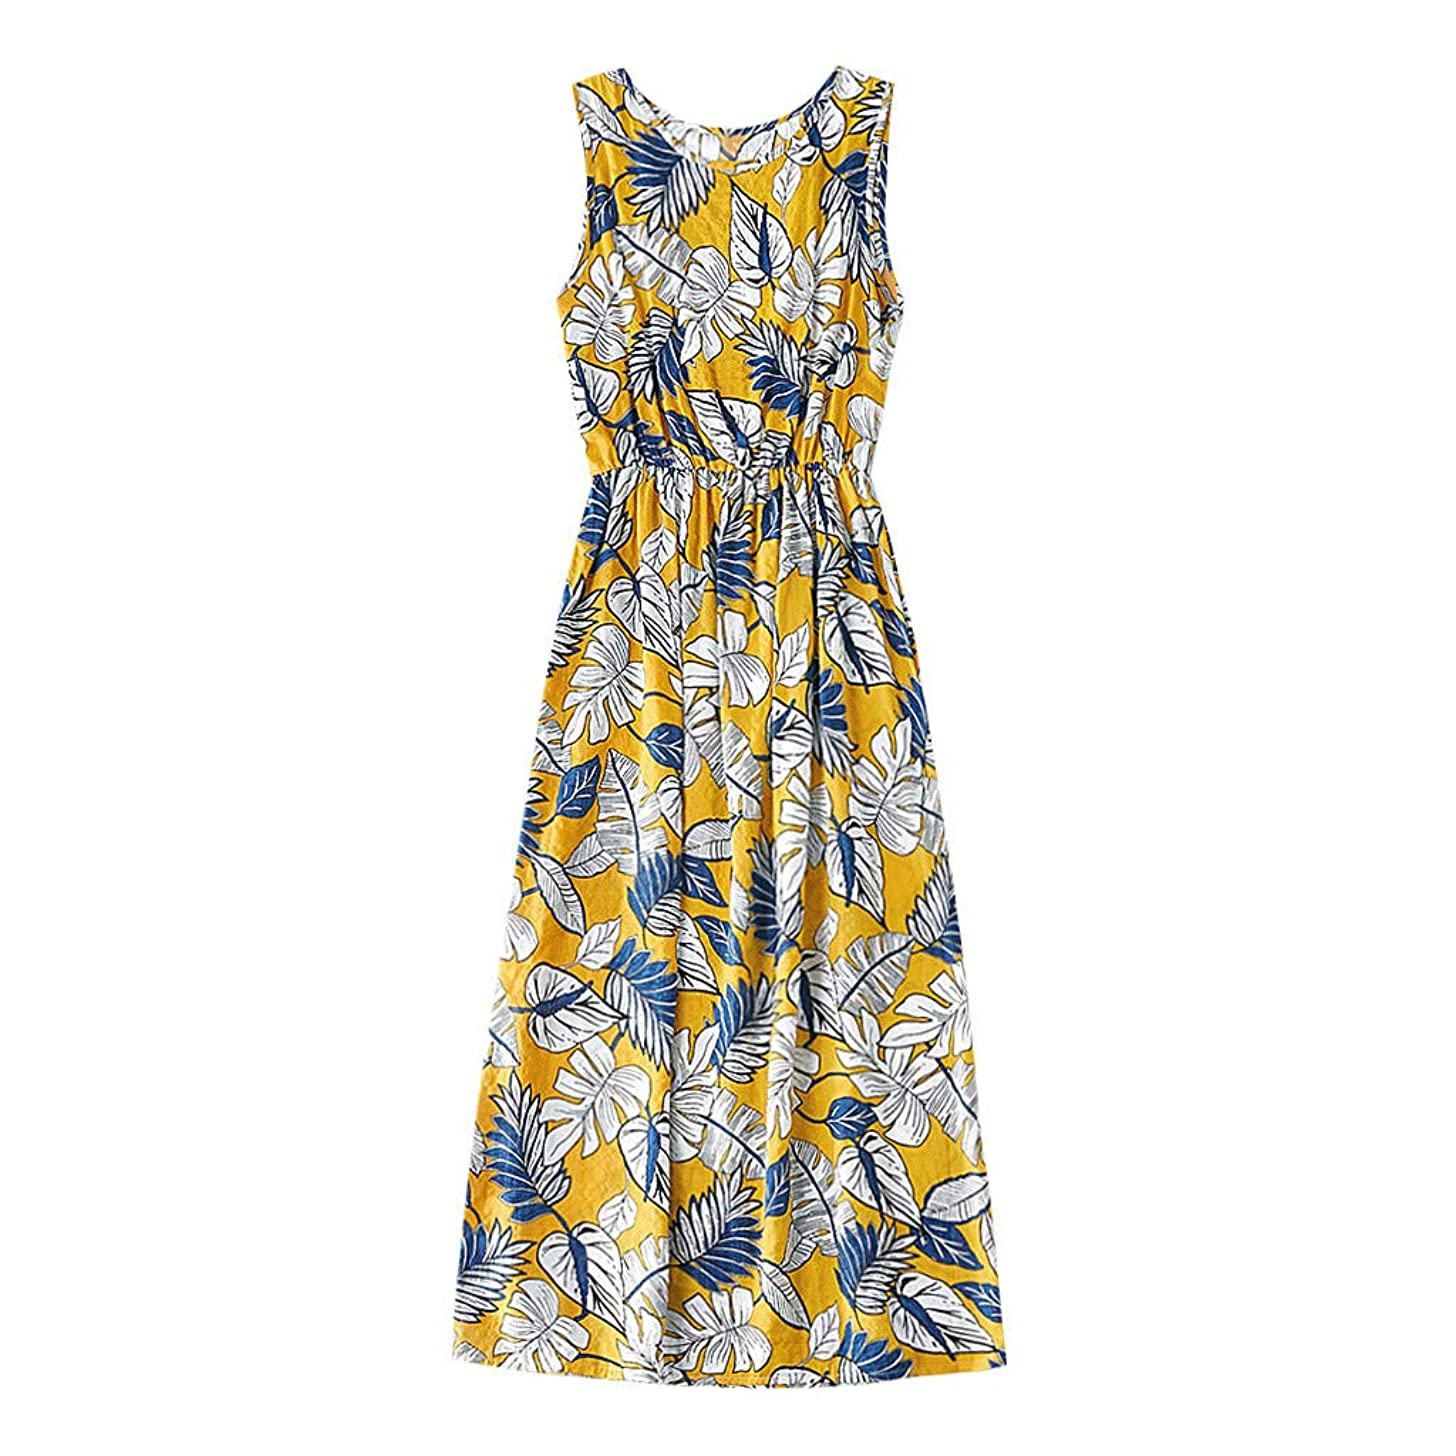 Women Sleeveless Swing Midi Dress Summer Casual Crew Neck Floral Print Tank Flowy Pleated Short Beach T-Shirt Dresses